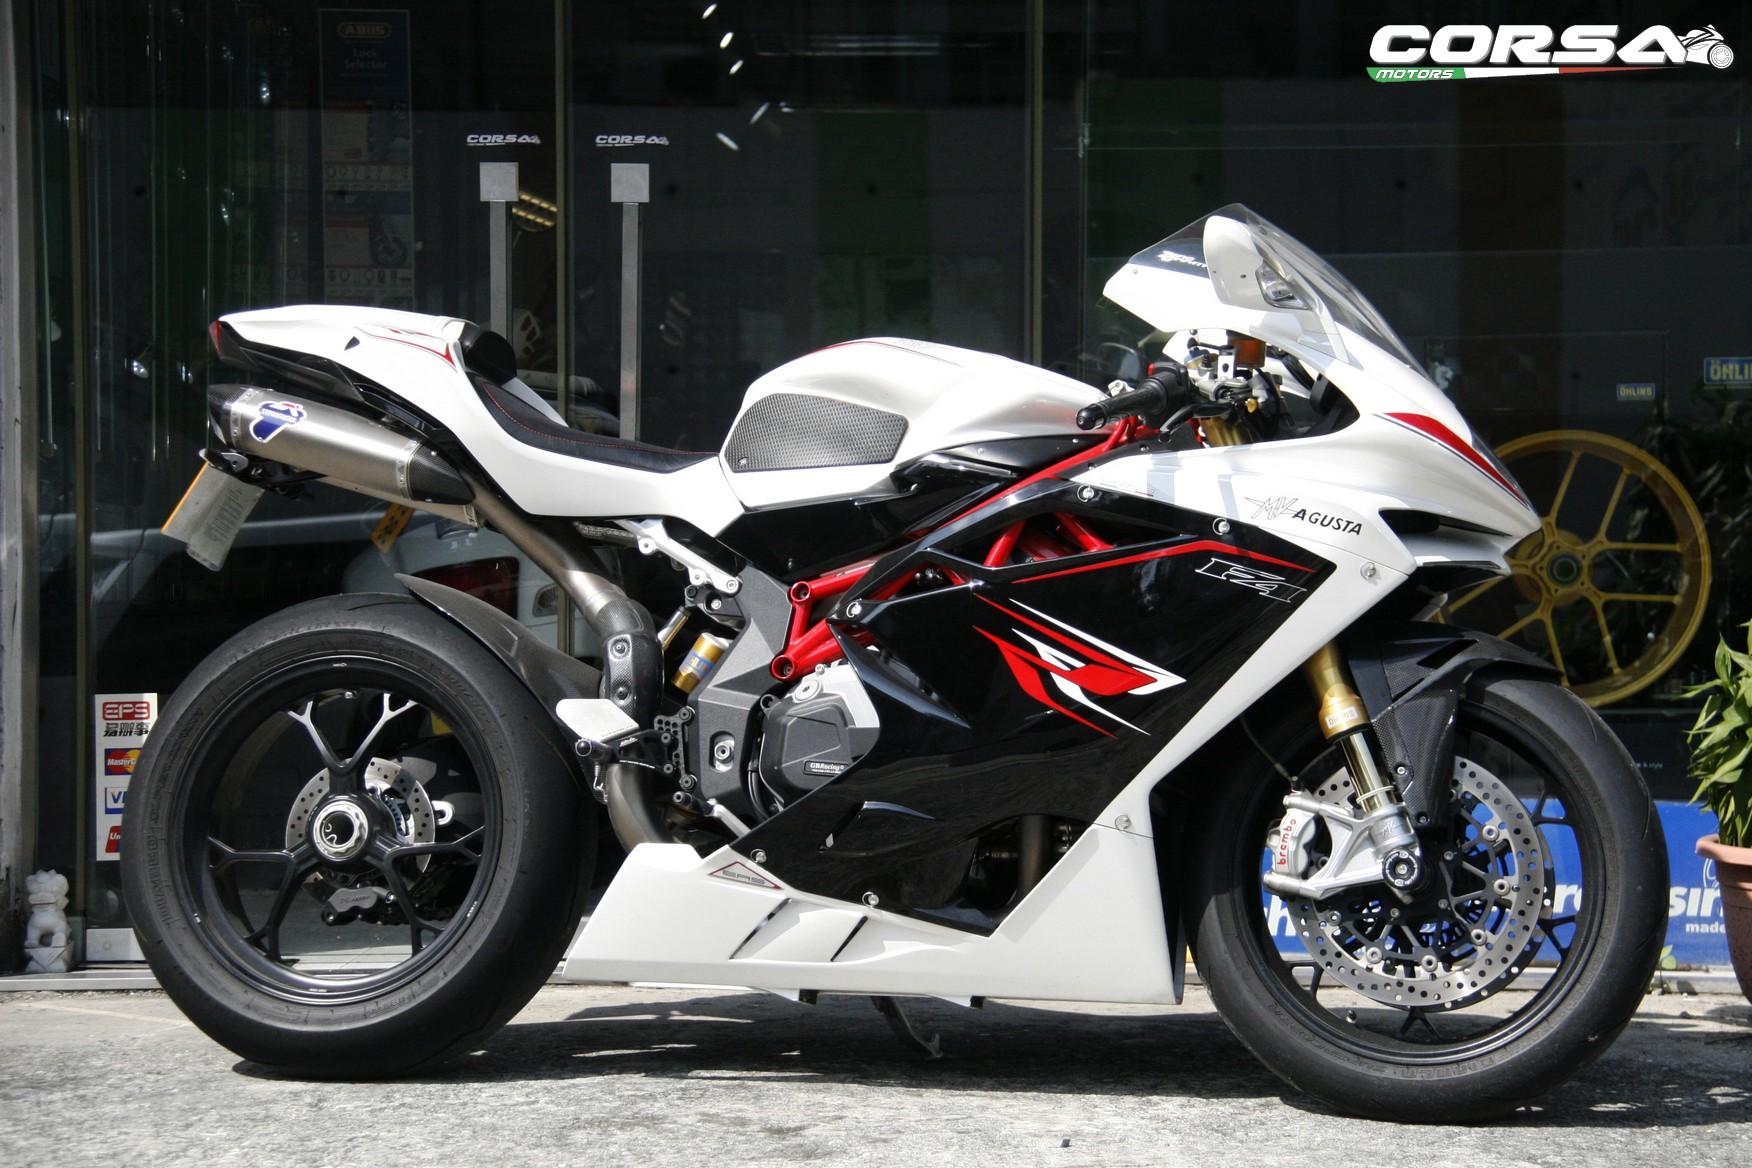 MV AGUSTA F4 RR 2013 白色 - 「Webike摩托車市」